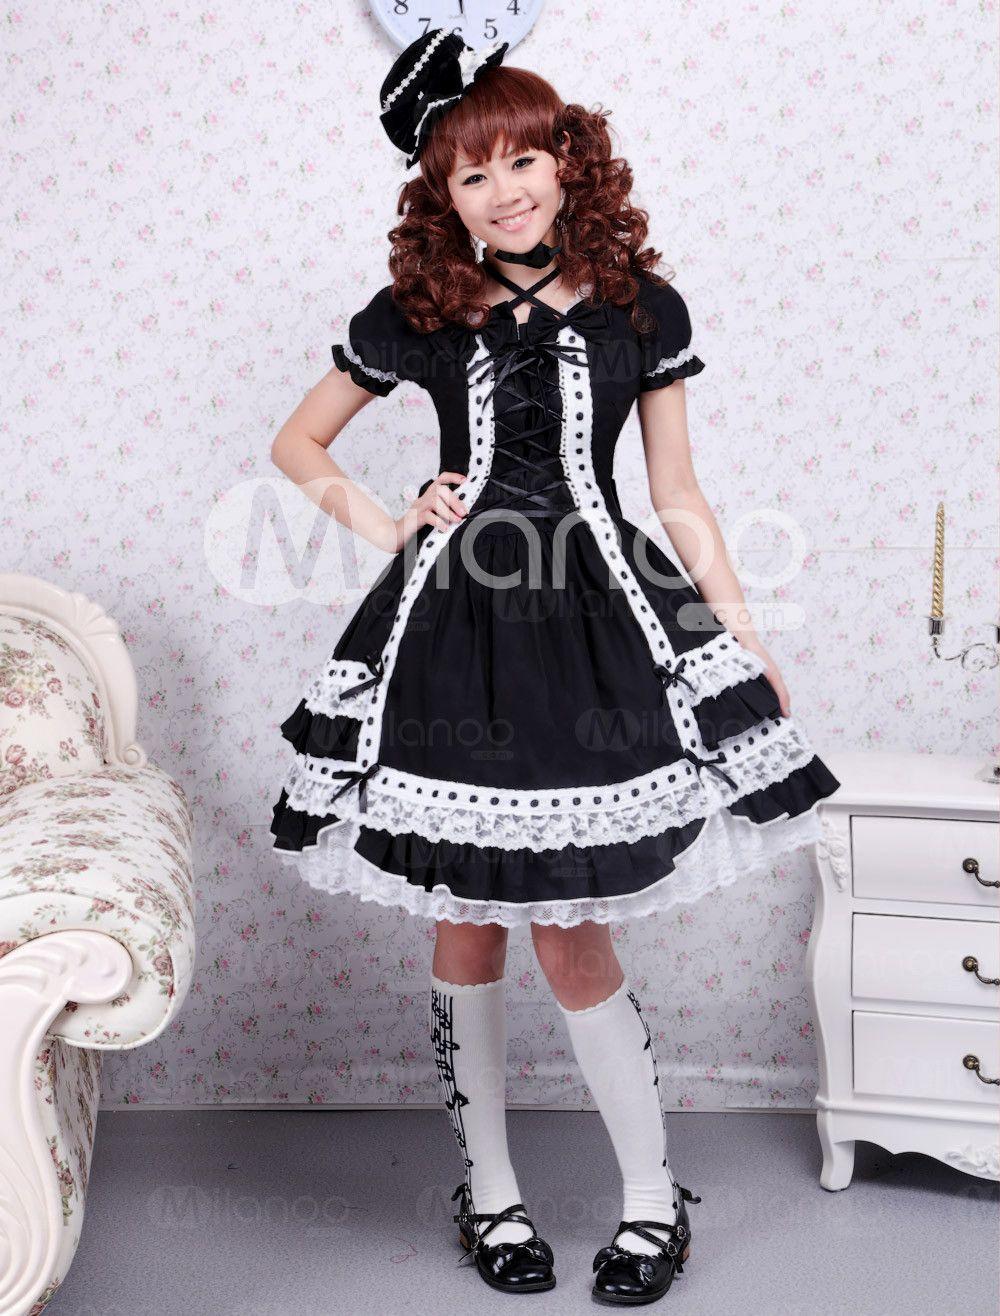 Black lolita onepiece dress short sleevs lace trim lace up lolita